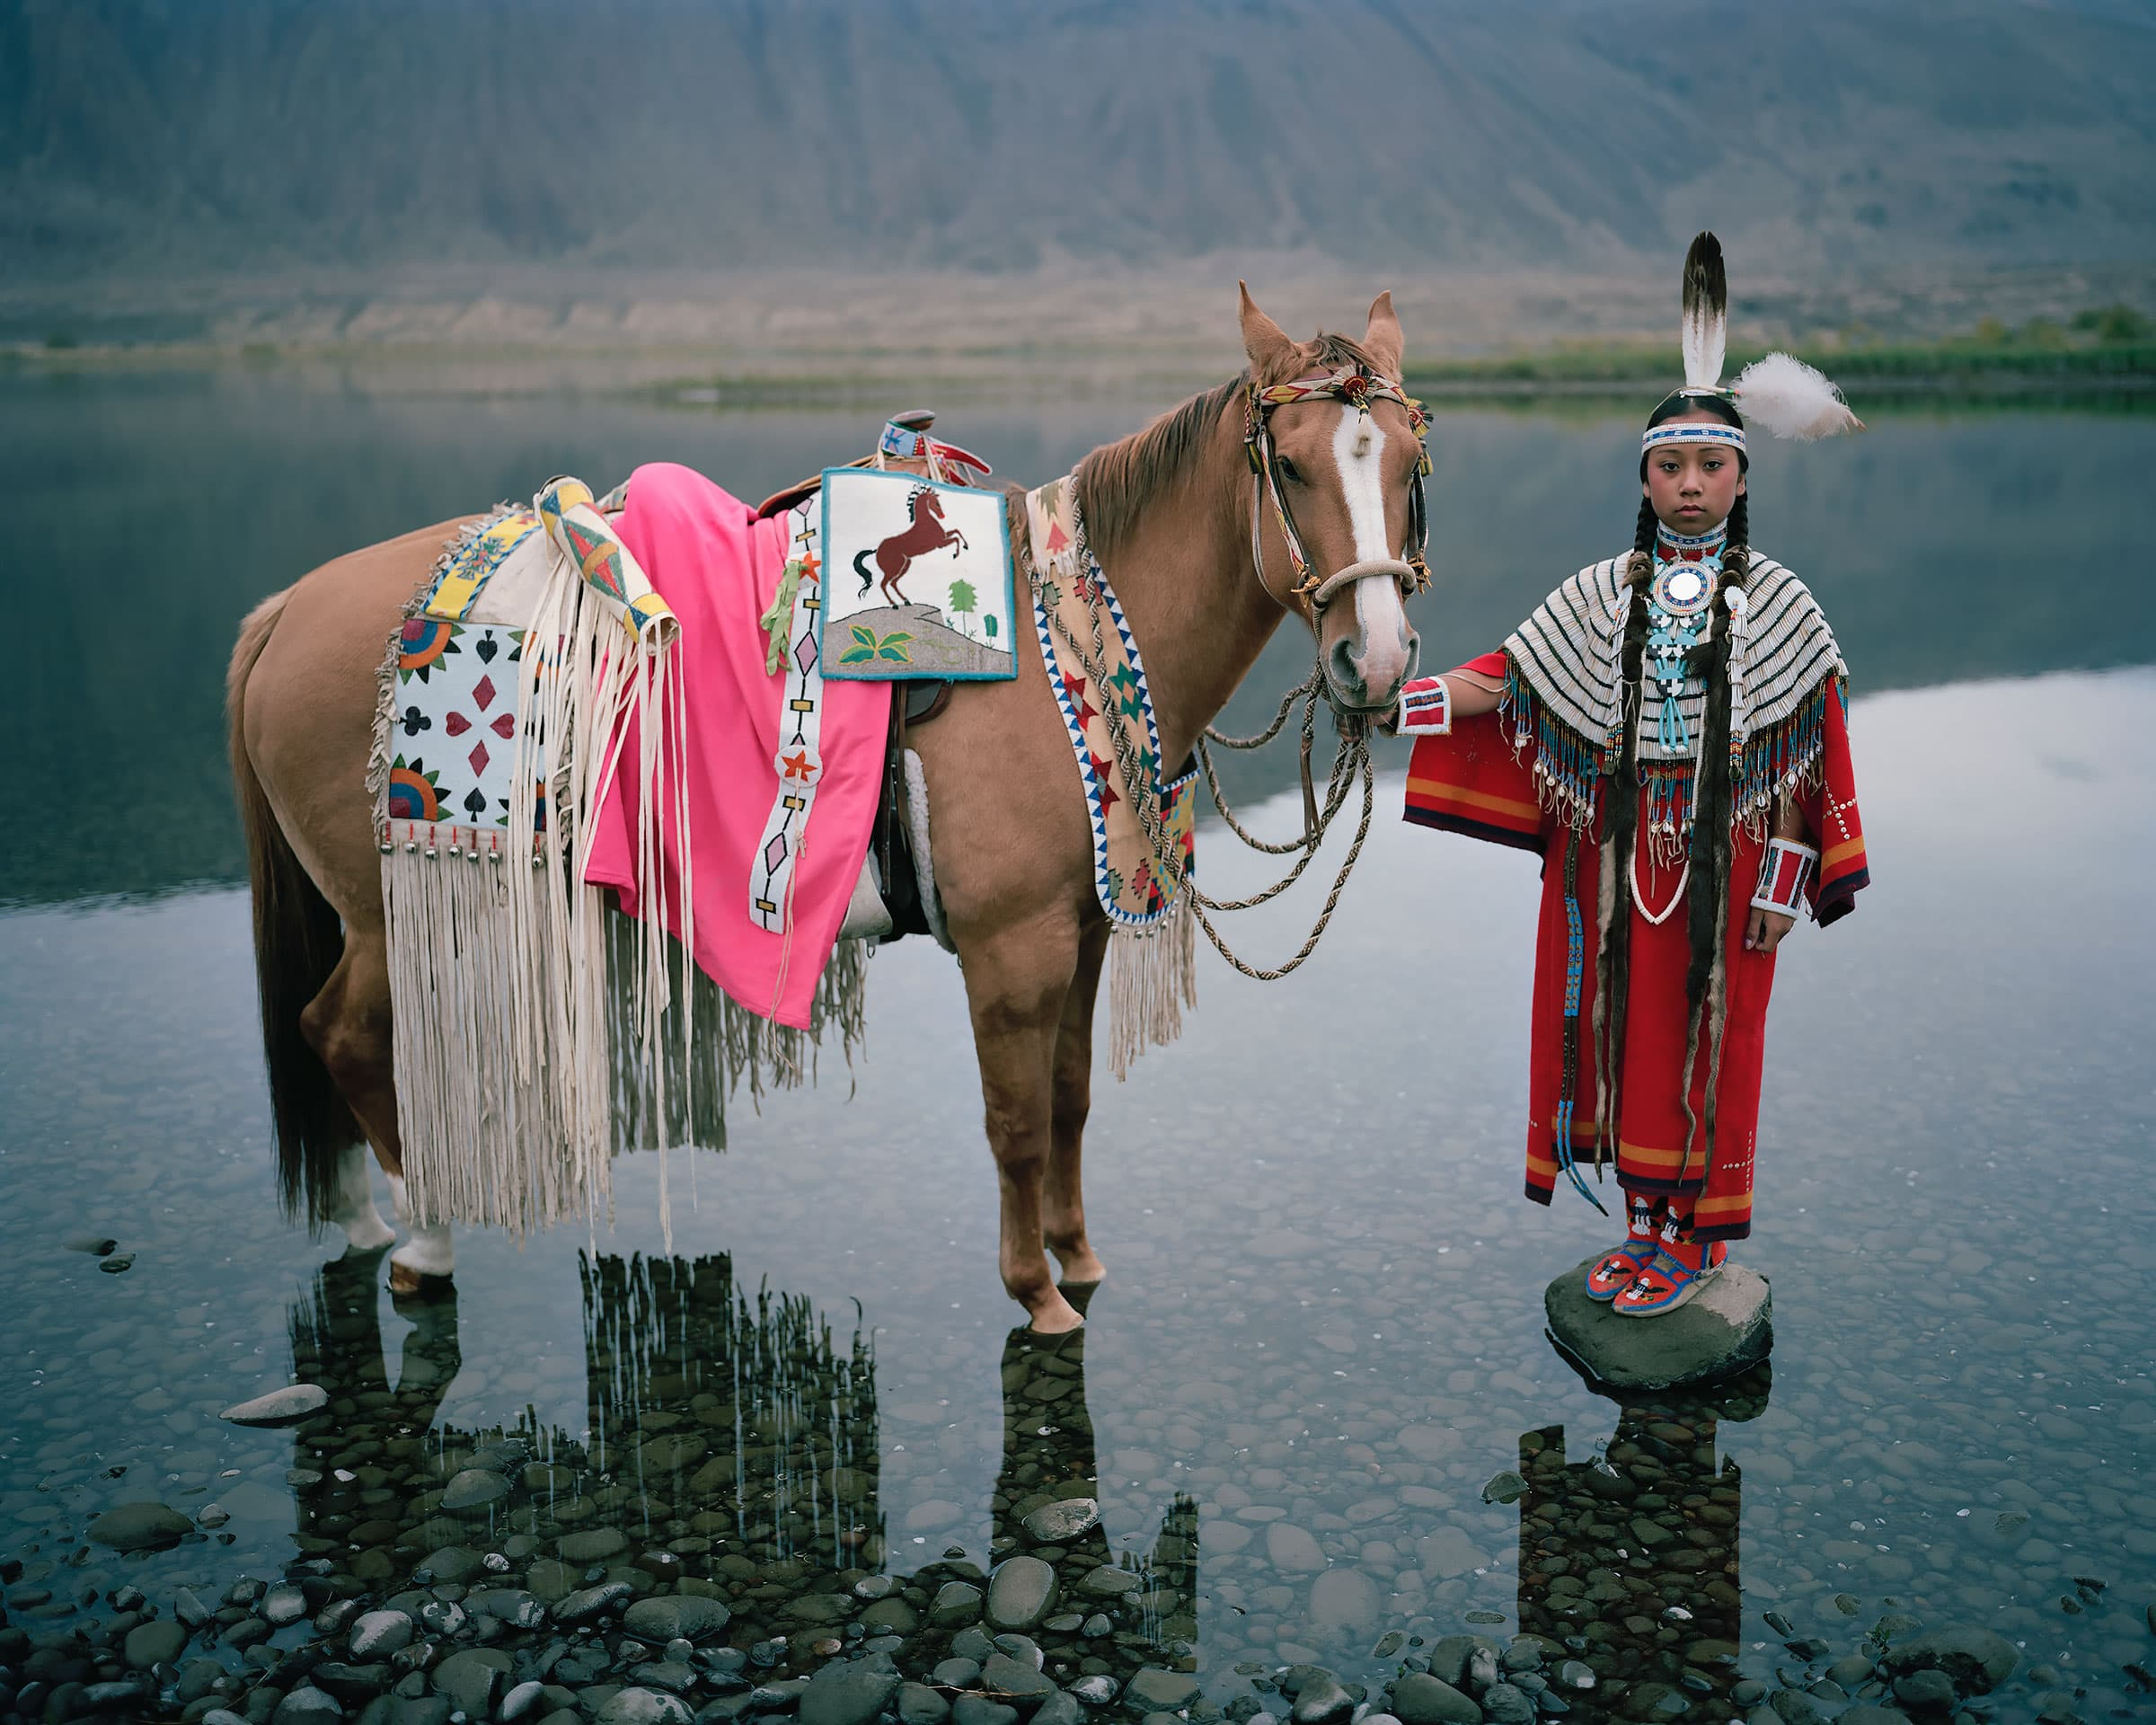 ©People of the Horse, Destiny Buck, Wanapum Erika Larsen